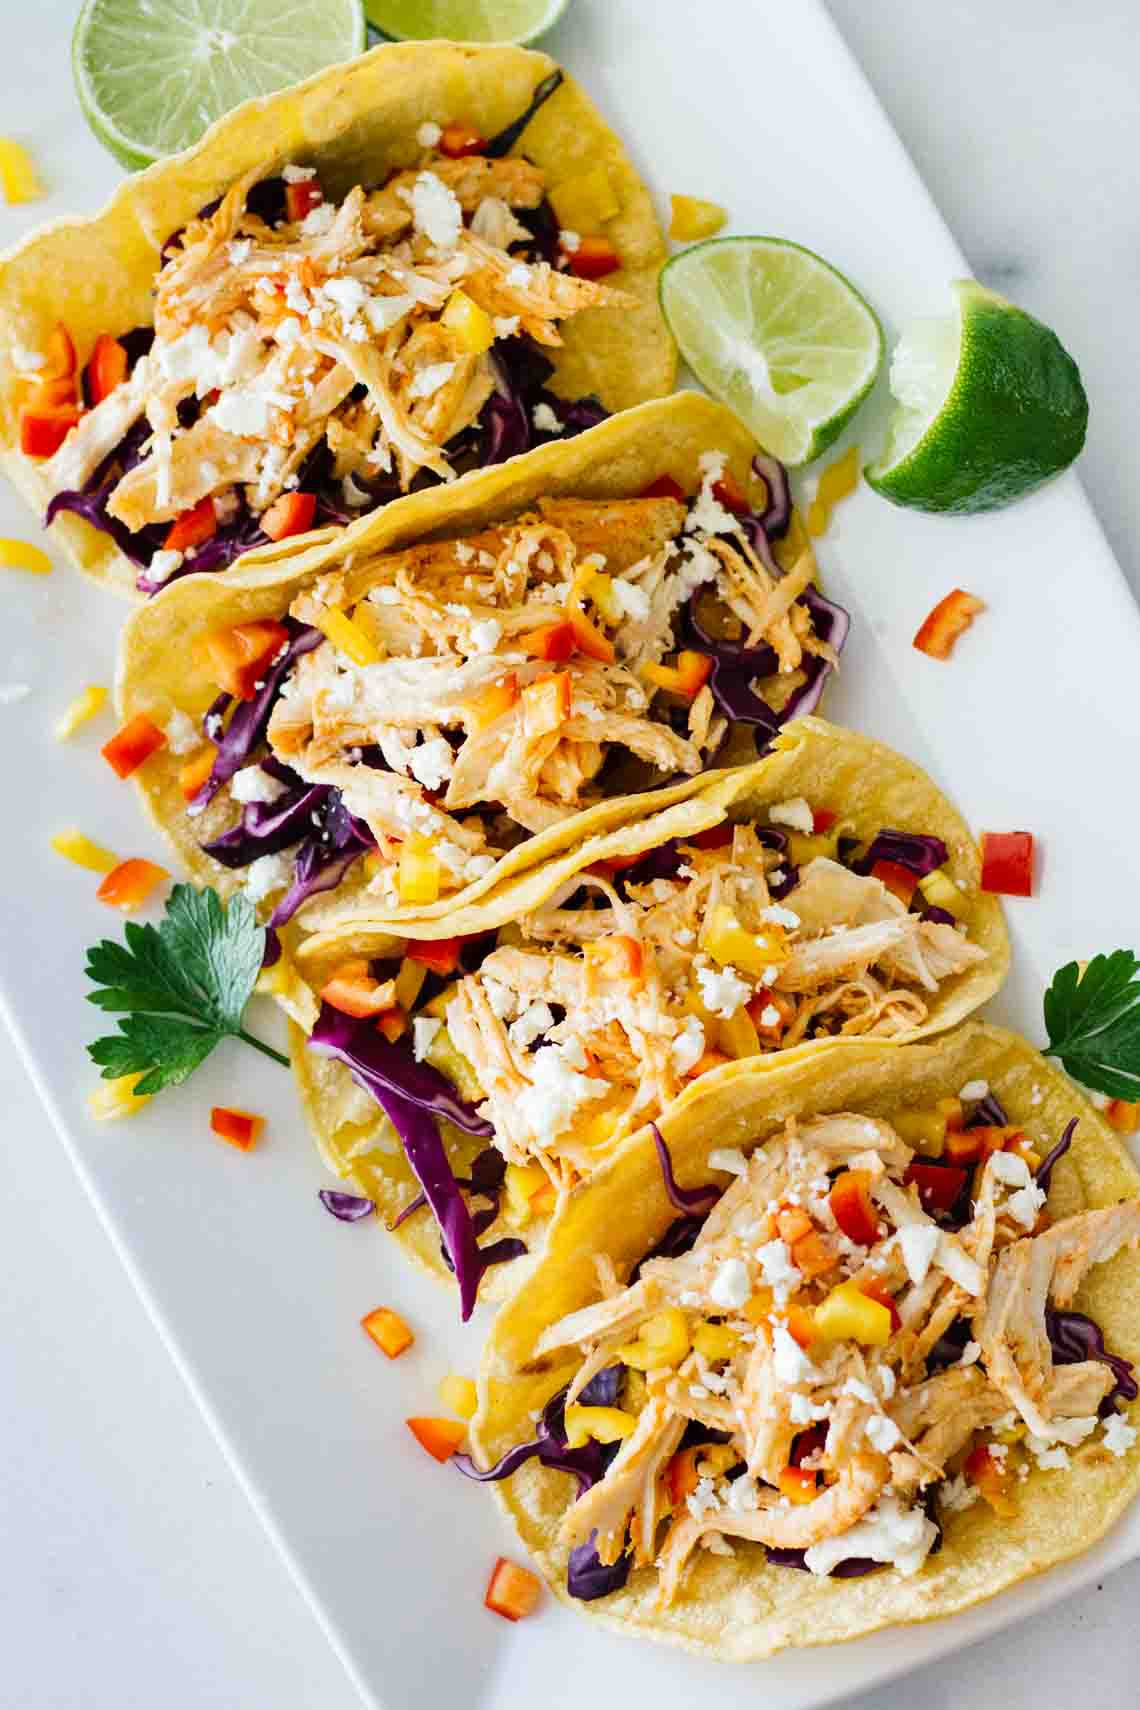 Healthy Simple Dinners  Healthy Sriracha Shredded Chicken Tacos Jar Lemons